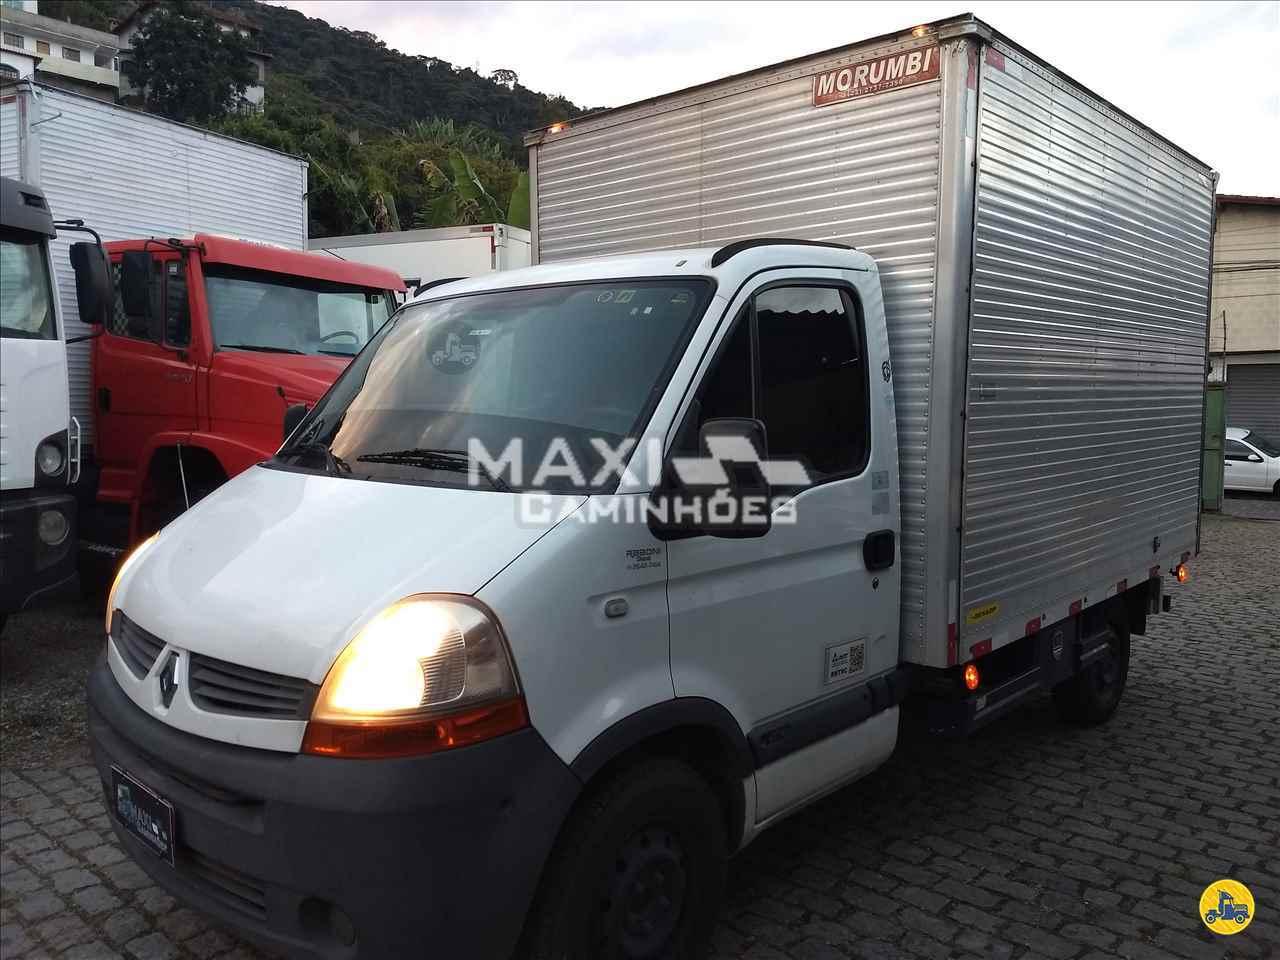 RENAULT Master Chassi Cabine 2.5 157000km 2011/2012 Maxi Caminhões